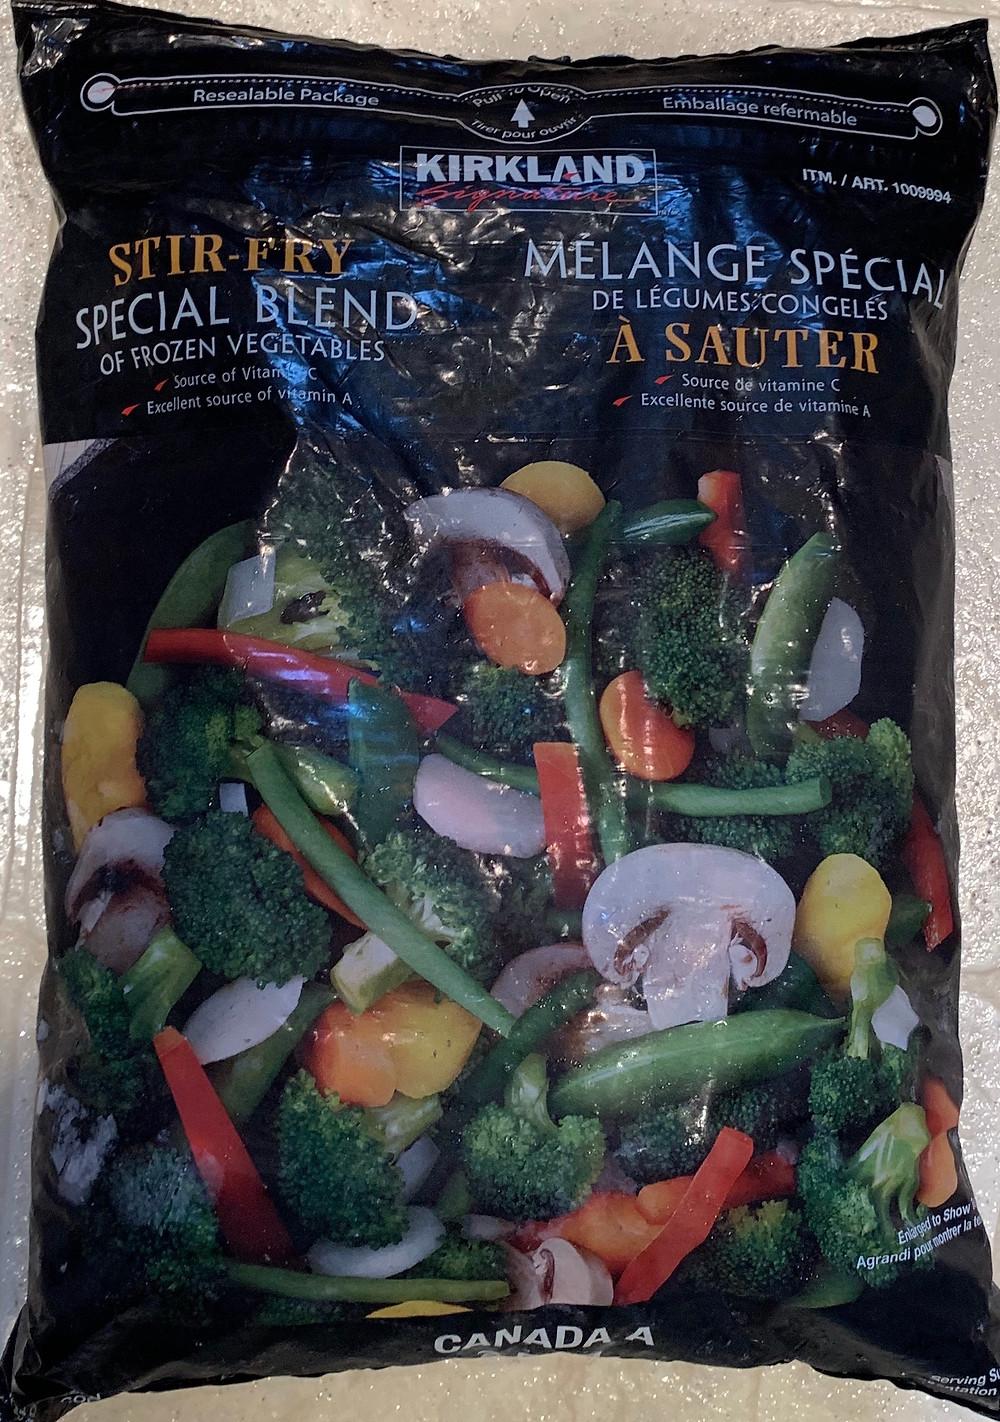 Costco Kirkland Signature Stir Fry Frozen Vegetable Special Blend